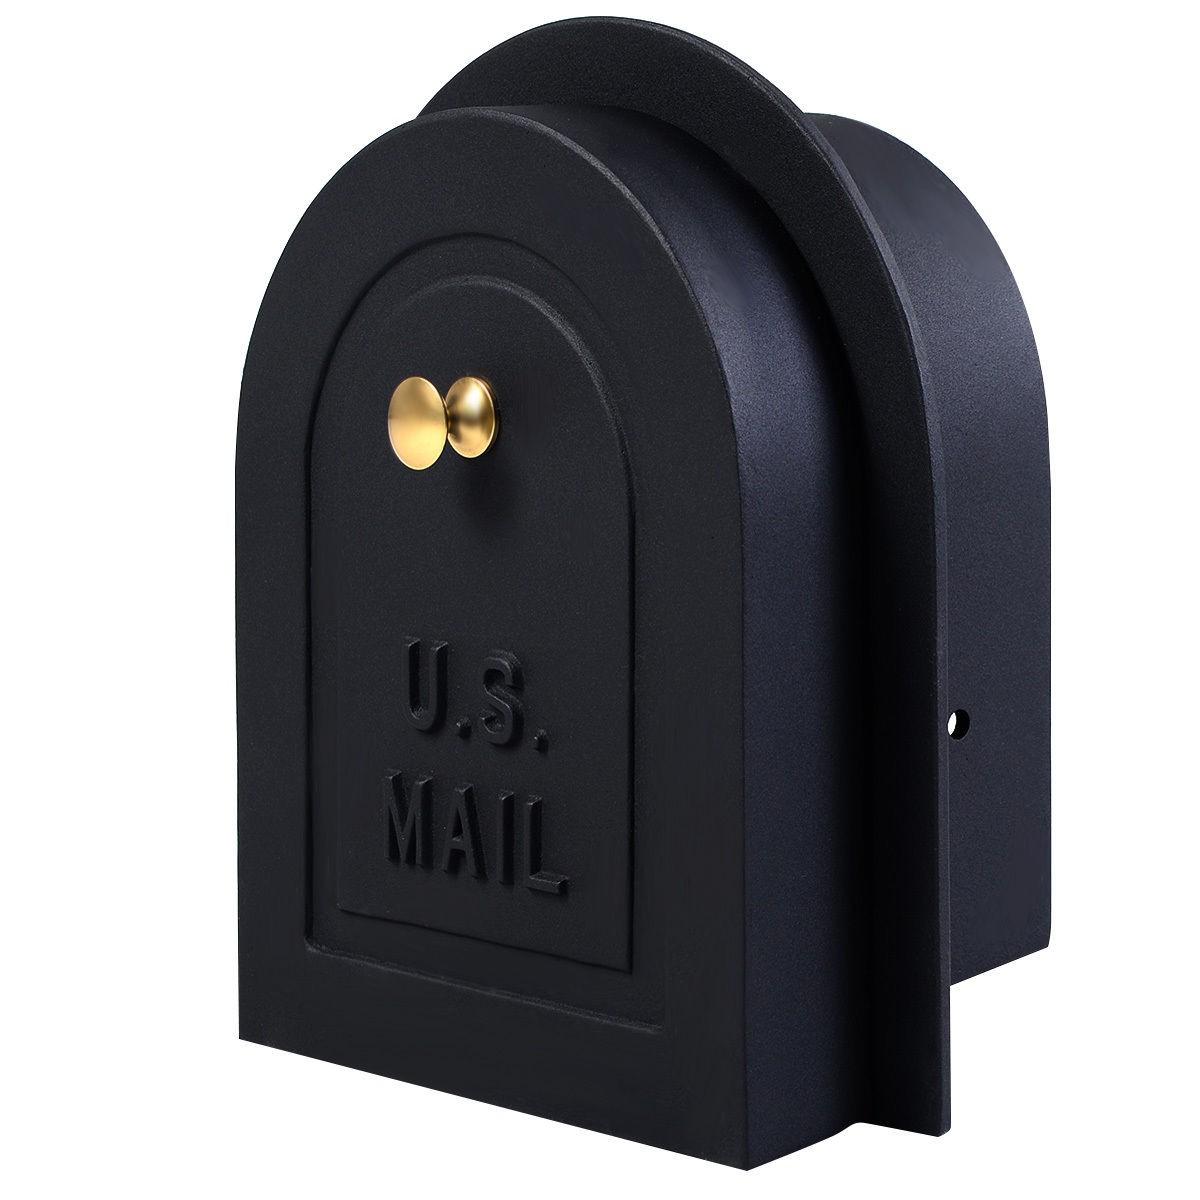 "Costway 8"" Replacement Cast Aluminum Mailbox Door $29.95 + Free Shipping"